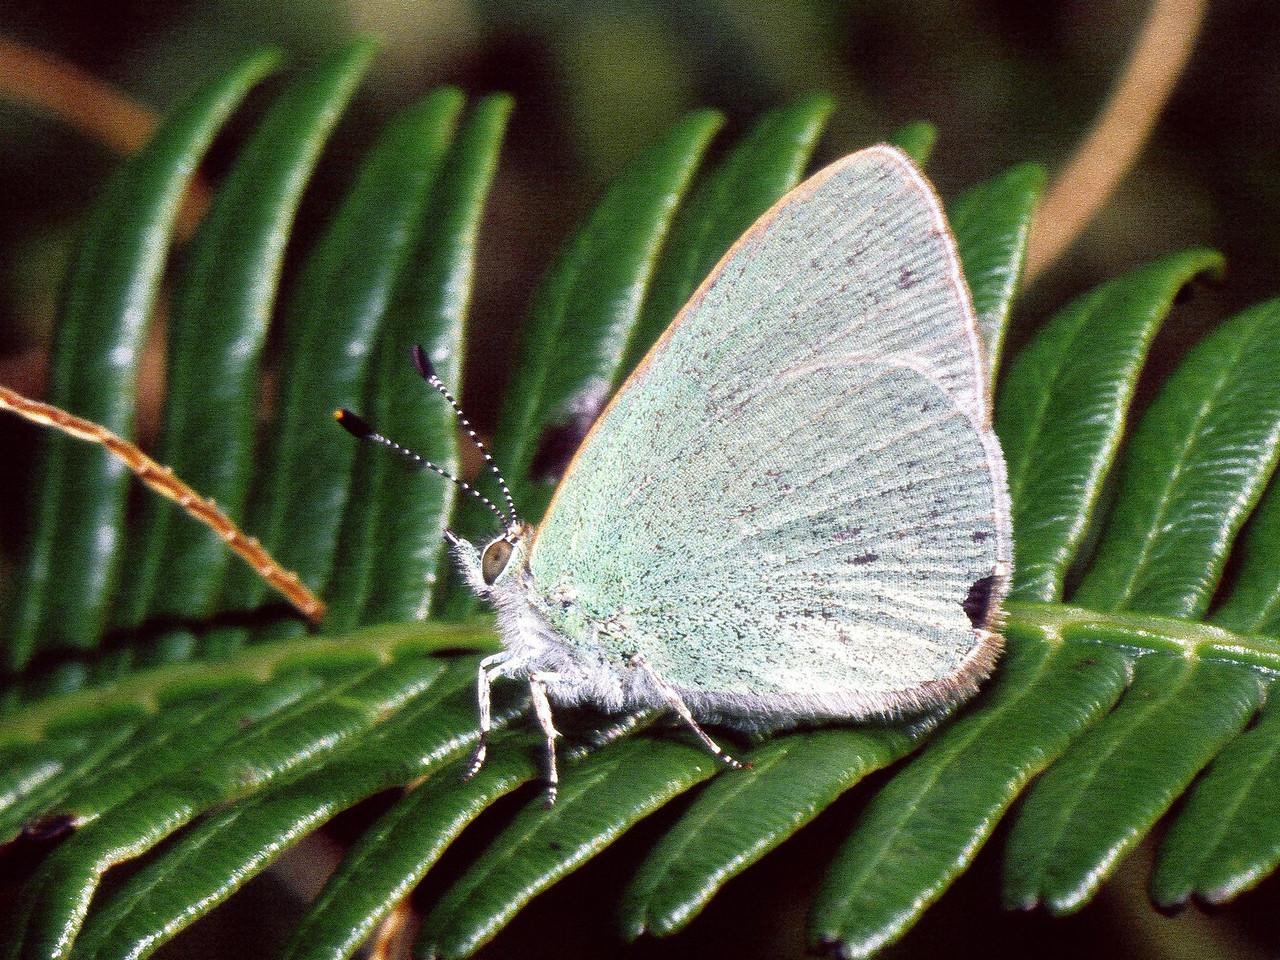 Udara blackburnii (Lepidoptera: Lycaenidae), West Maui